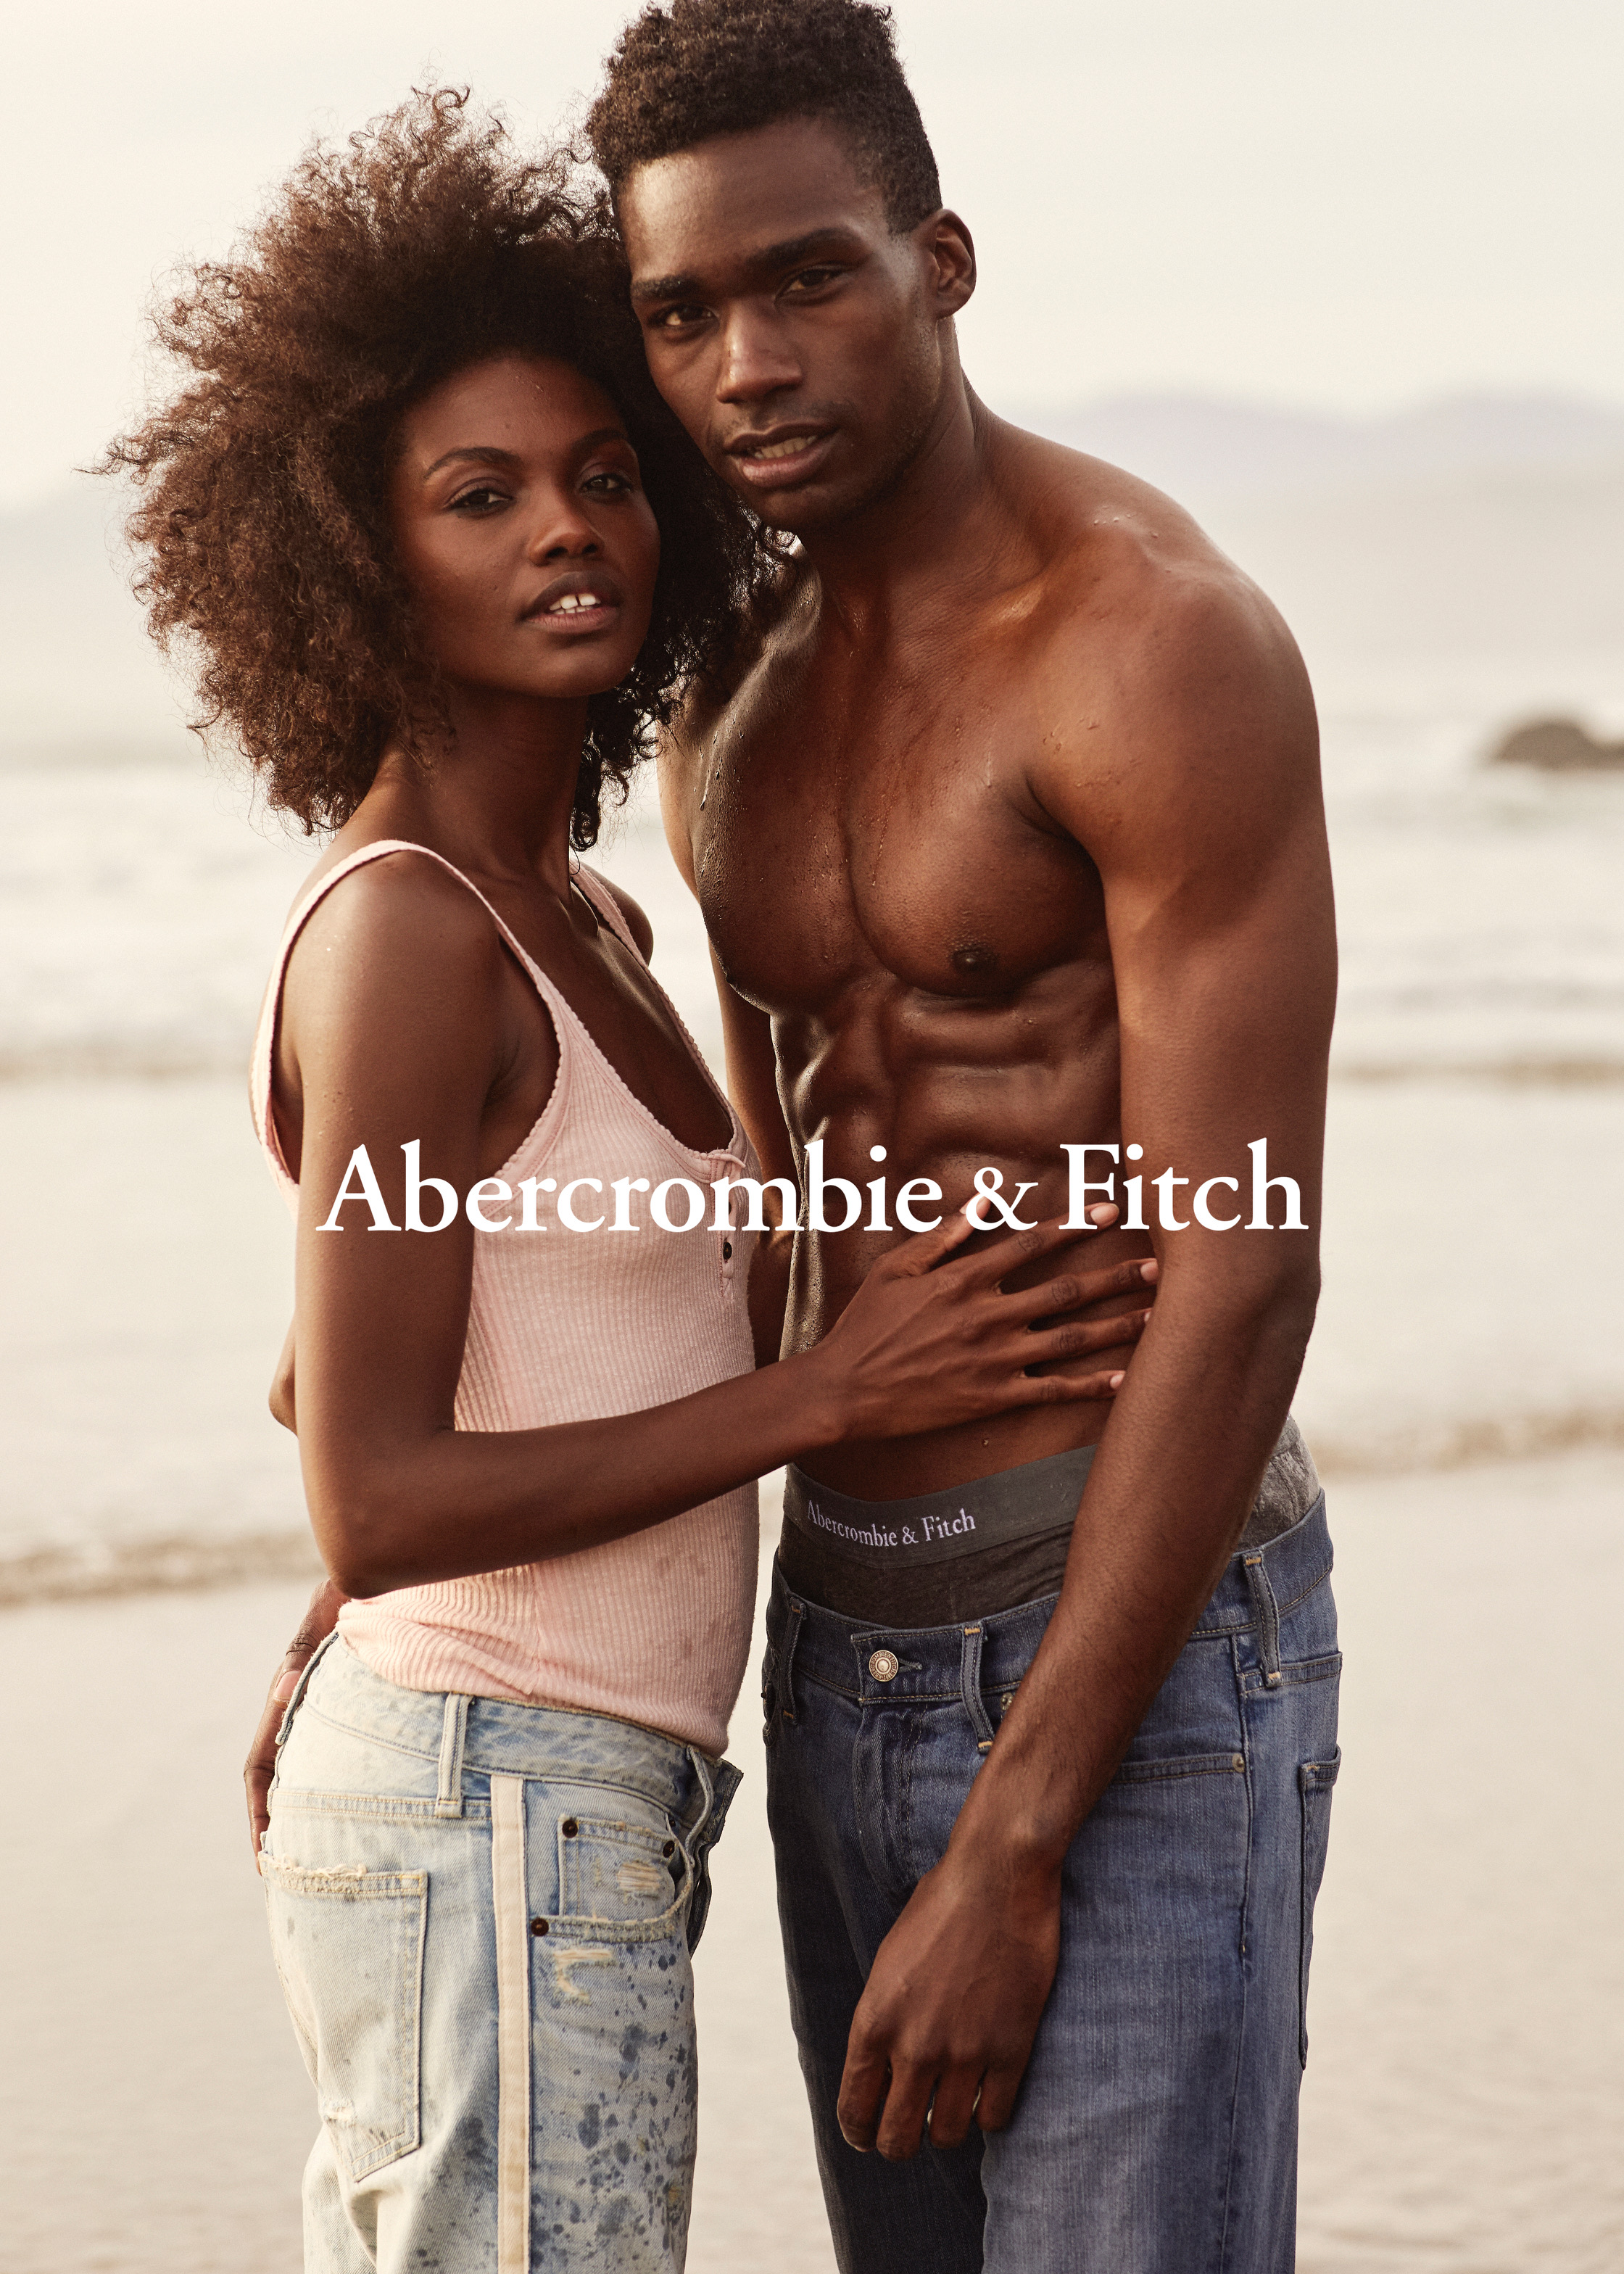 Abercrombie&Fitch_SS18_Beachcc_2018_WeAreTheRhoads_KR_1221_Logo.jpg